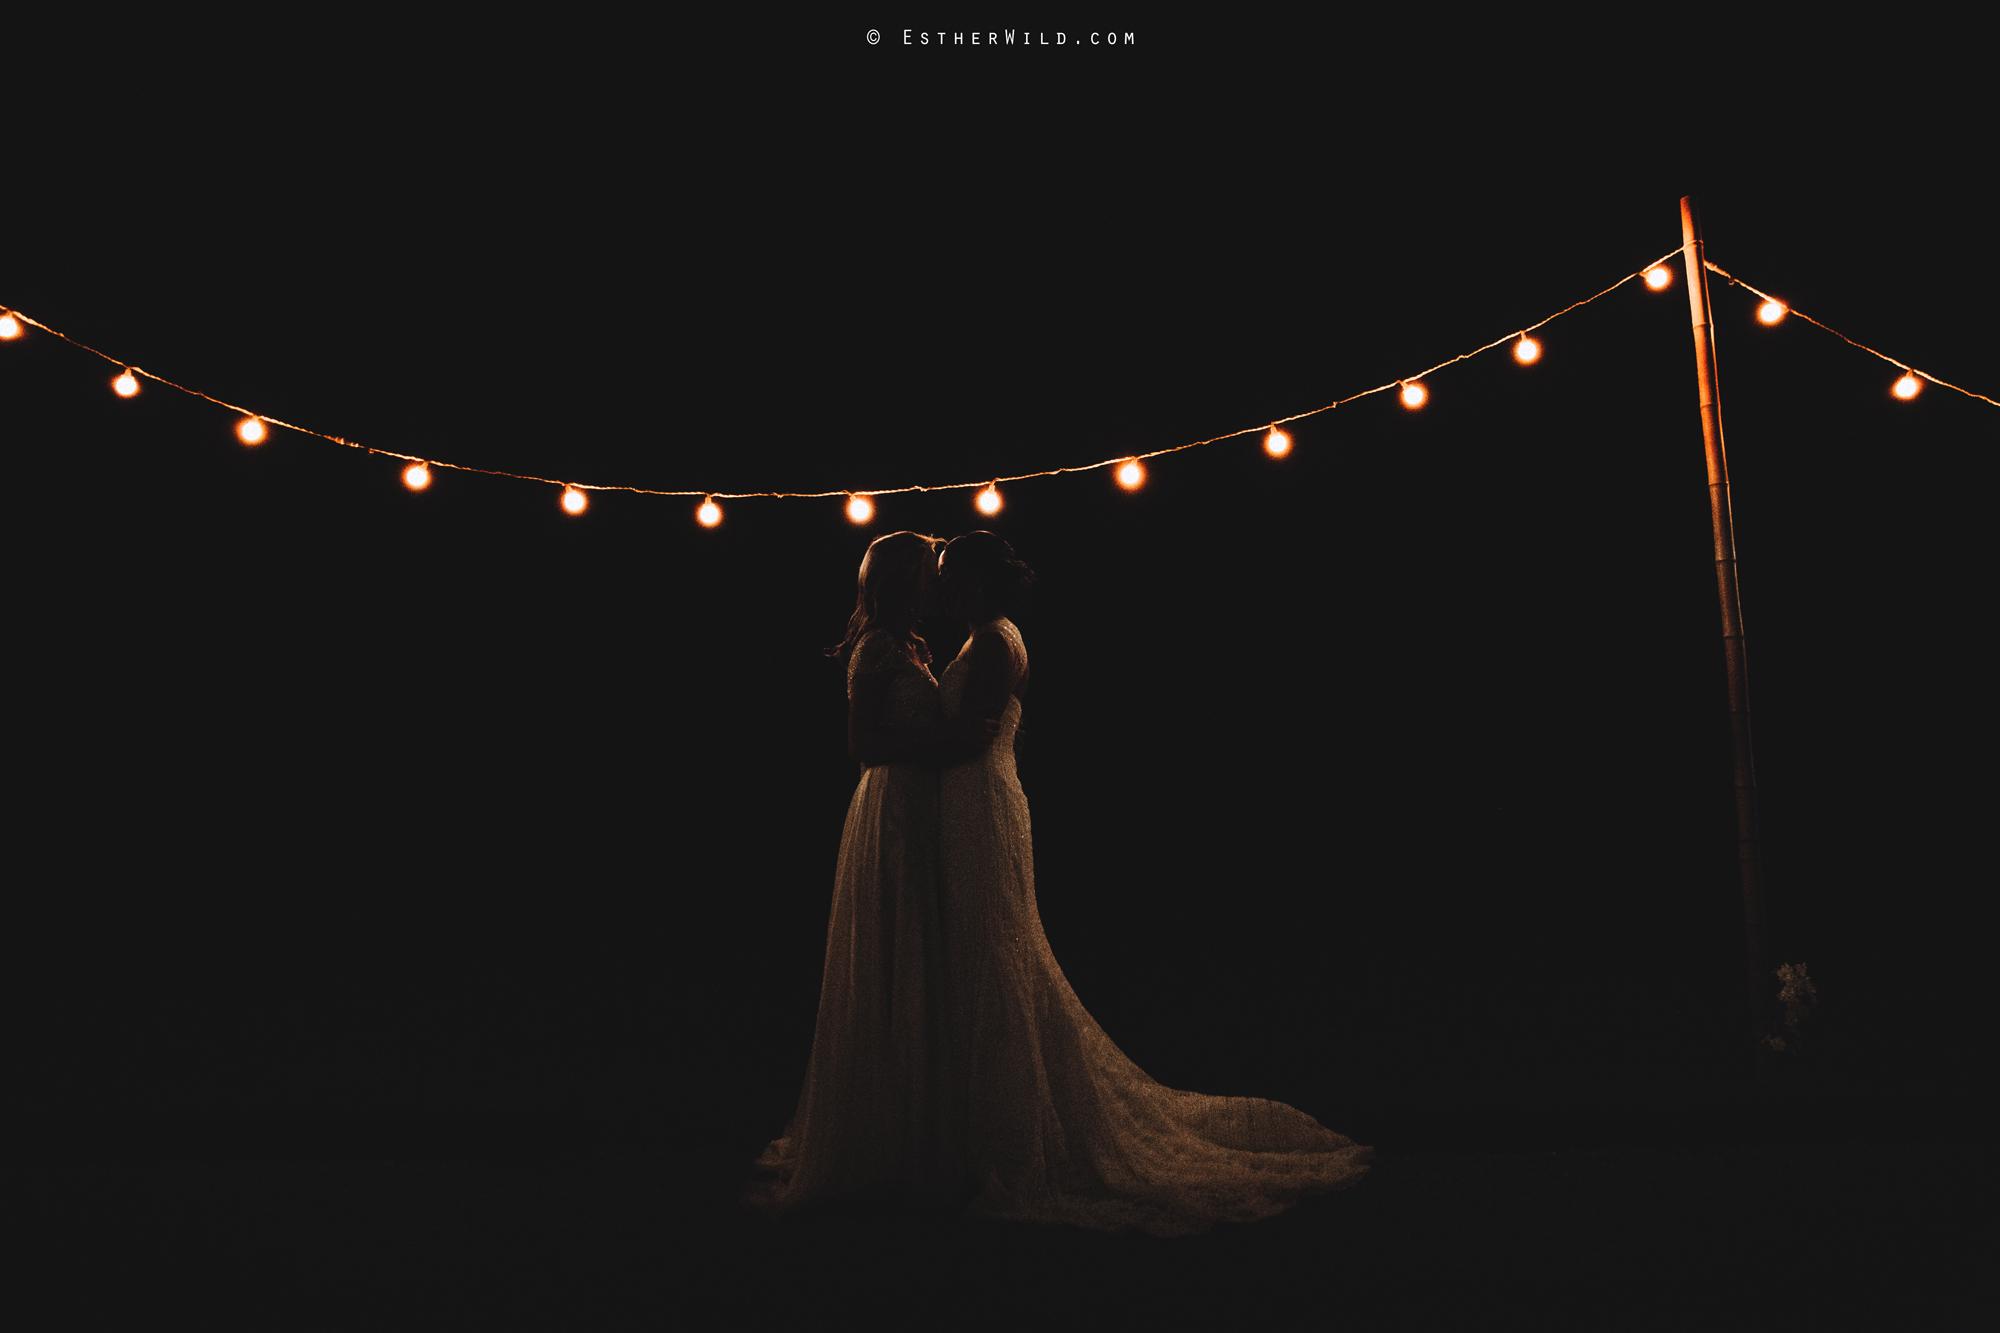 Elms_Barn_Weddings_Suffolk_Photographer_Copyright_Esther_Wild_IMG_3103.jpg